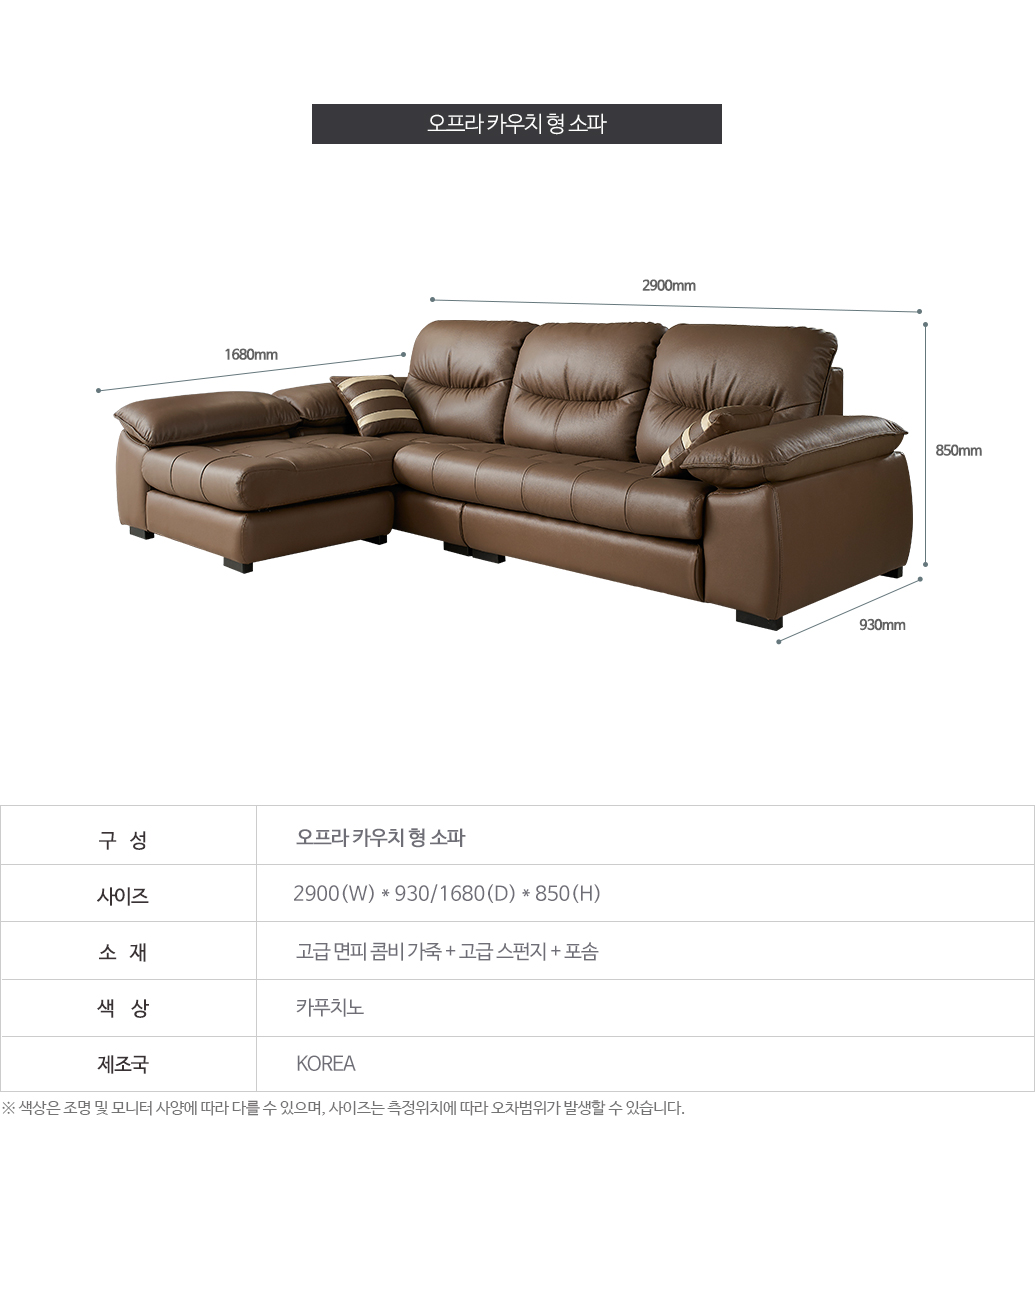 gr_oprah_couch03.jpg